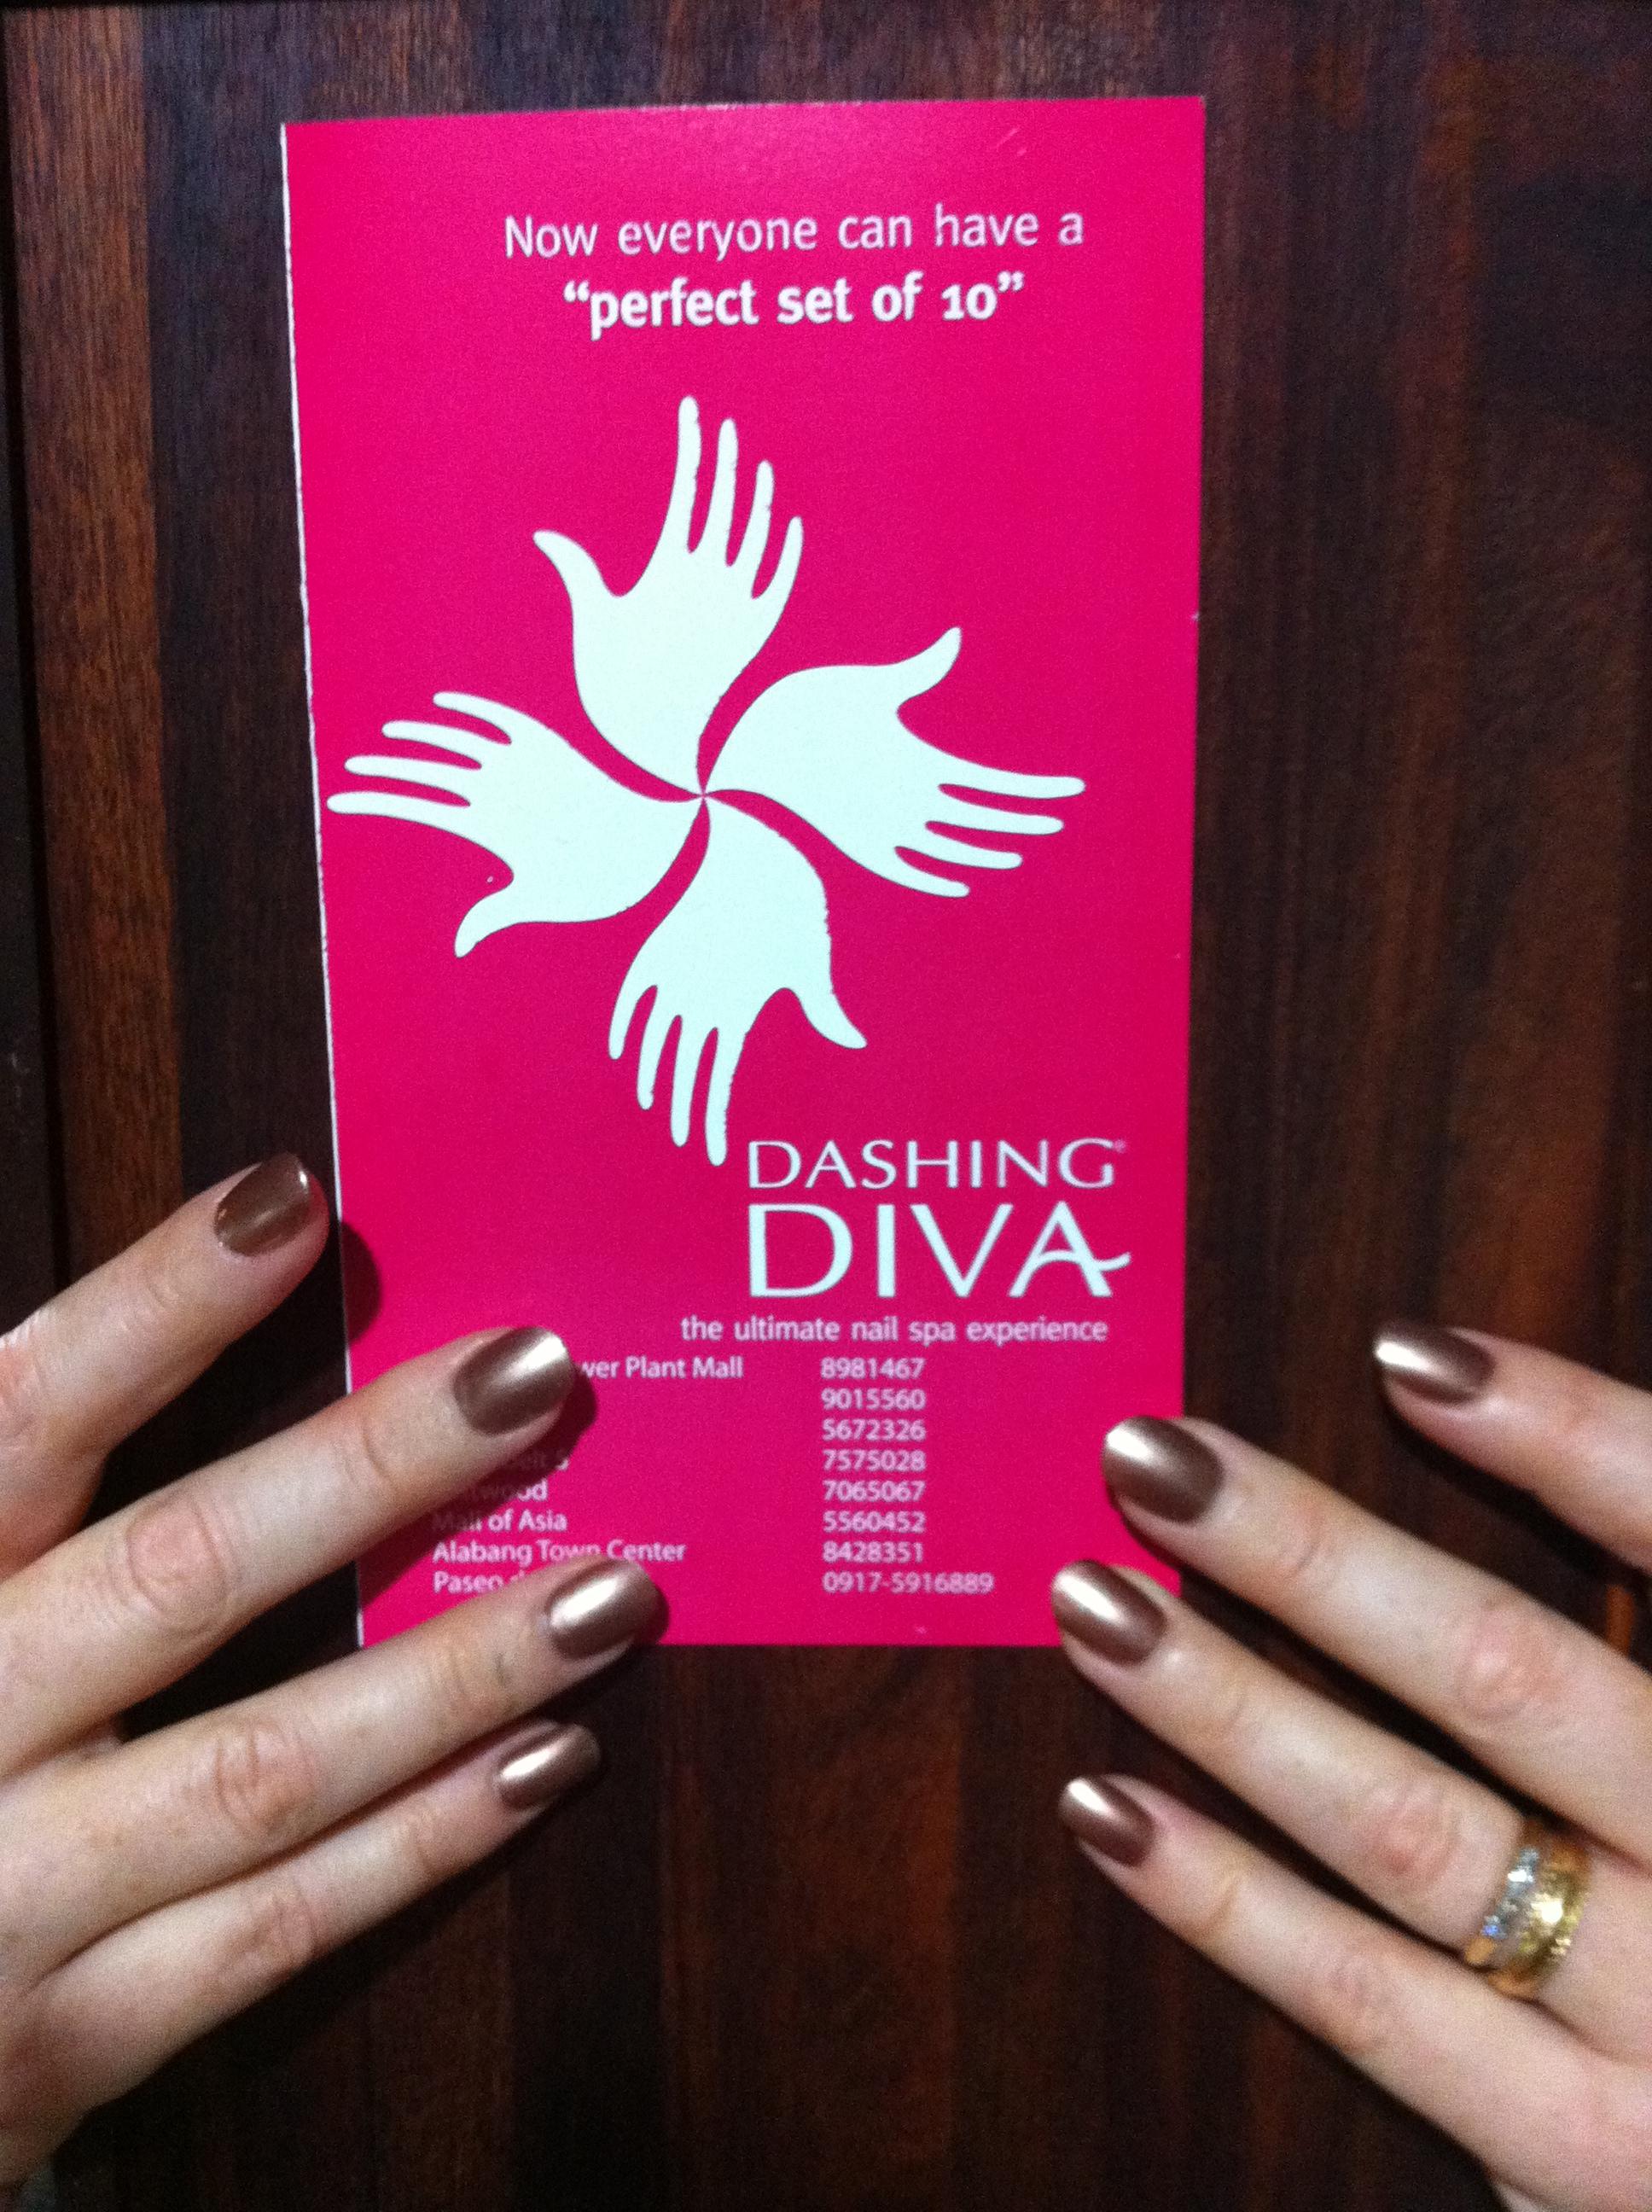 Dashing Diva Nail Salon Prices | Best Nail Designs 2018